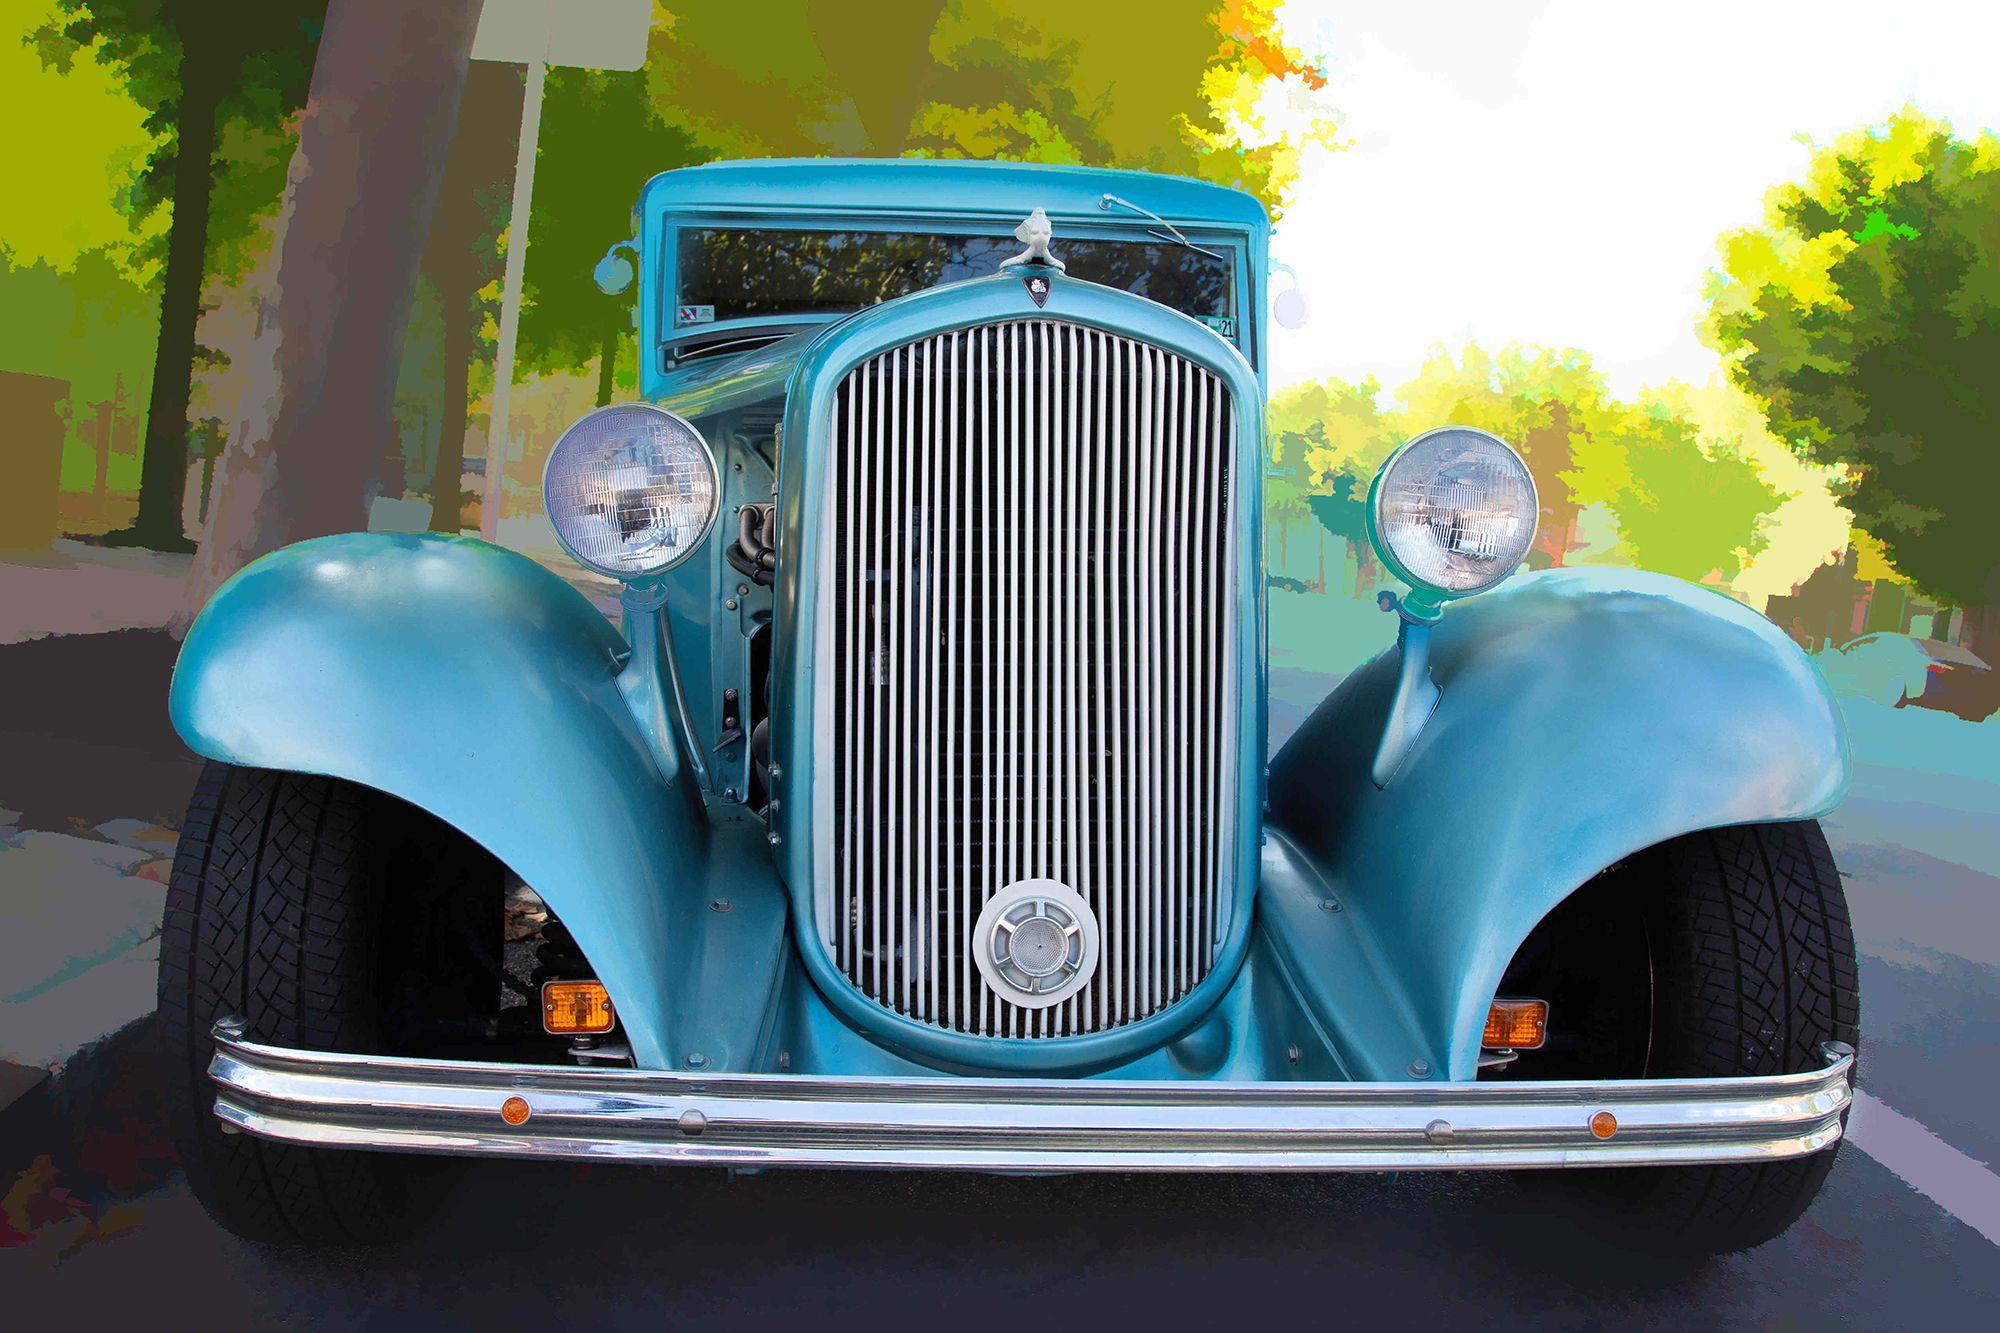 Classic Car4-1415-PbN2.jpg